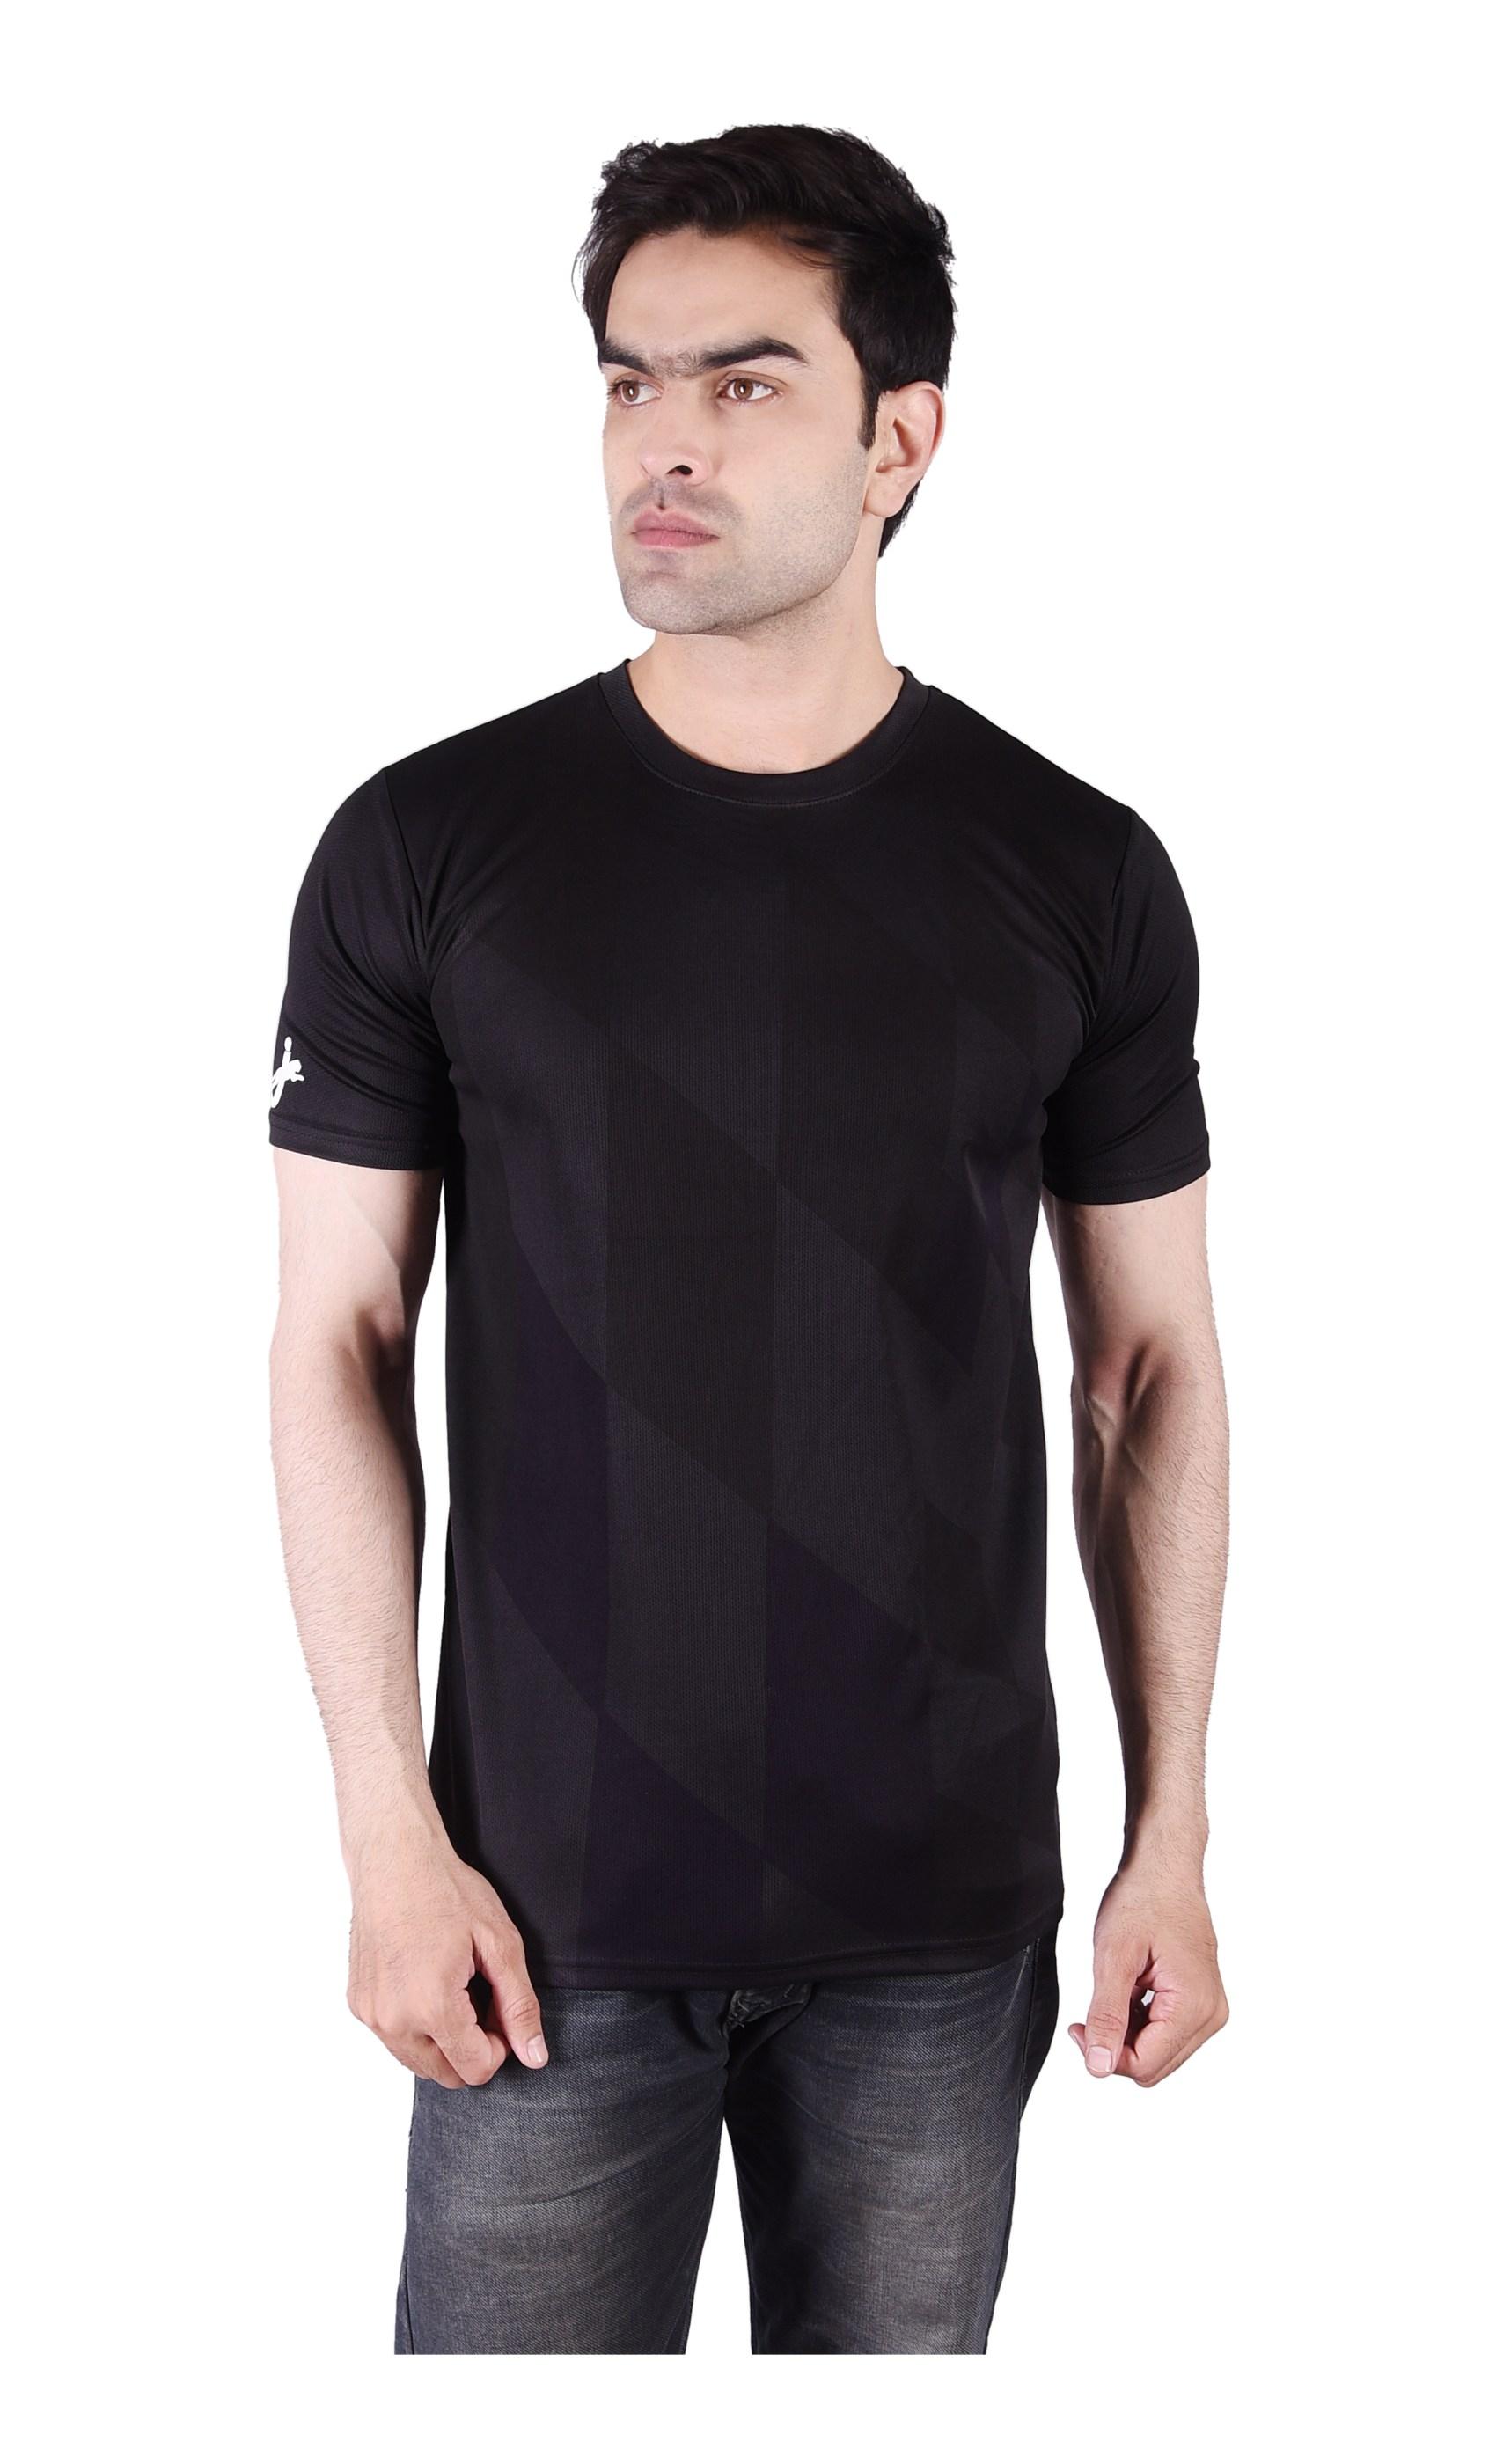 JAGURO | JAGURO men's printed polyester T-Shirt.